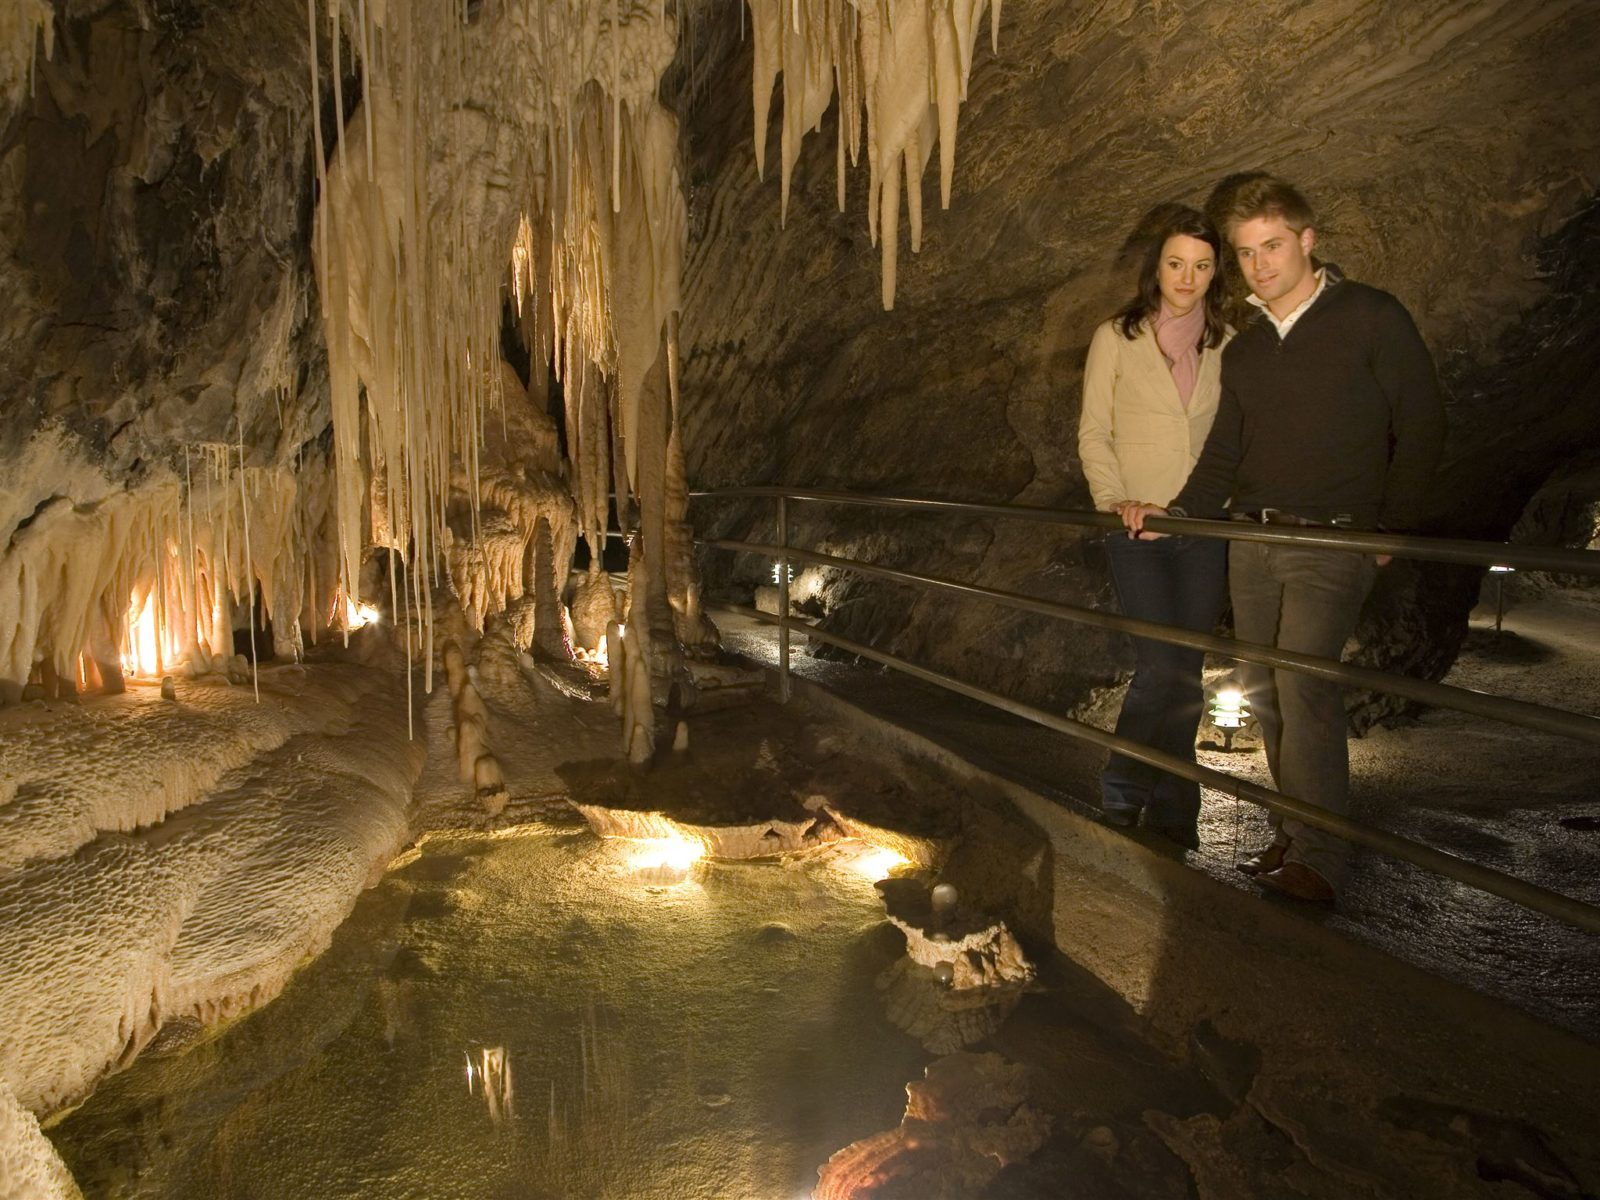 Marakoopa Cave Underground Rivers Tour